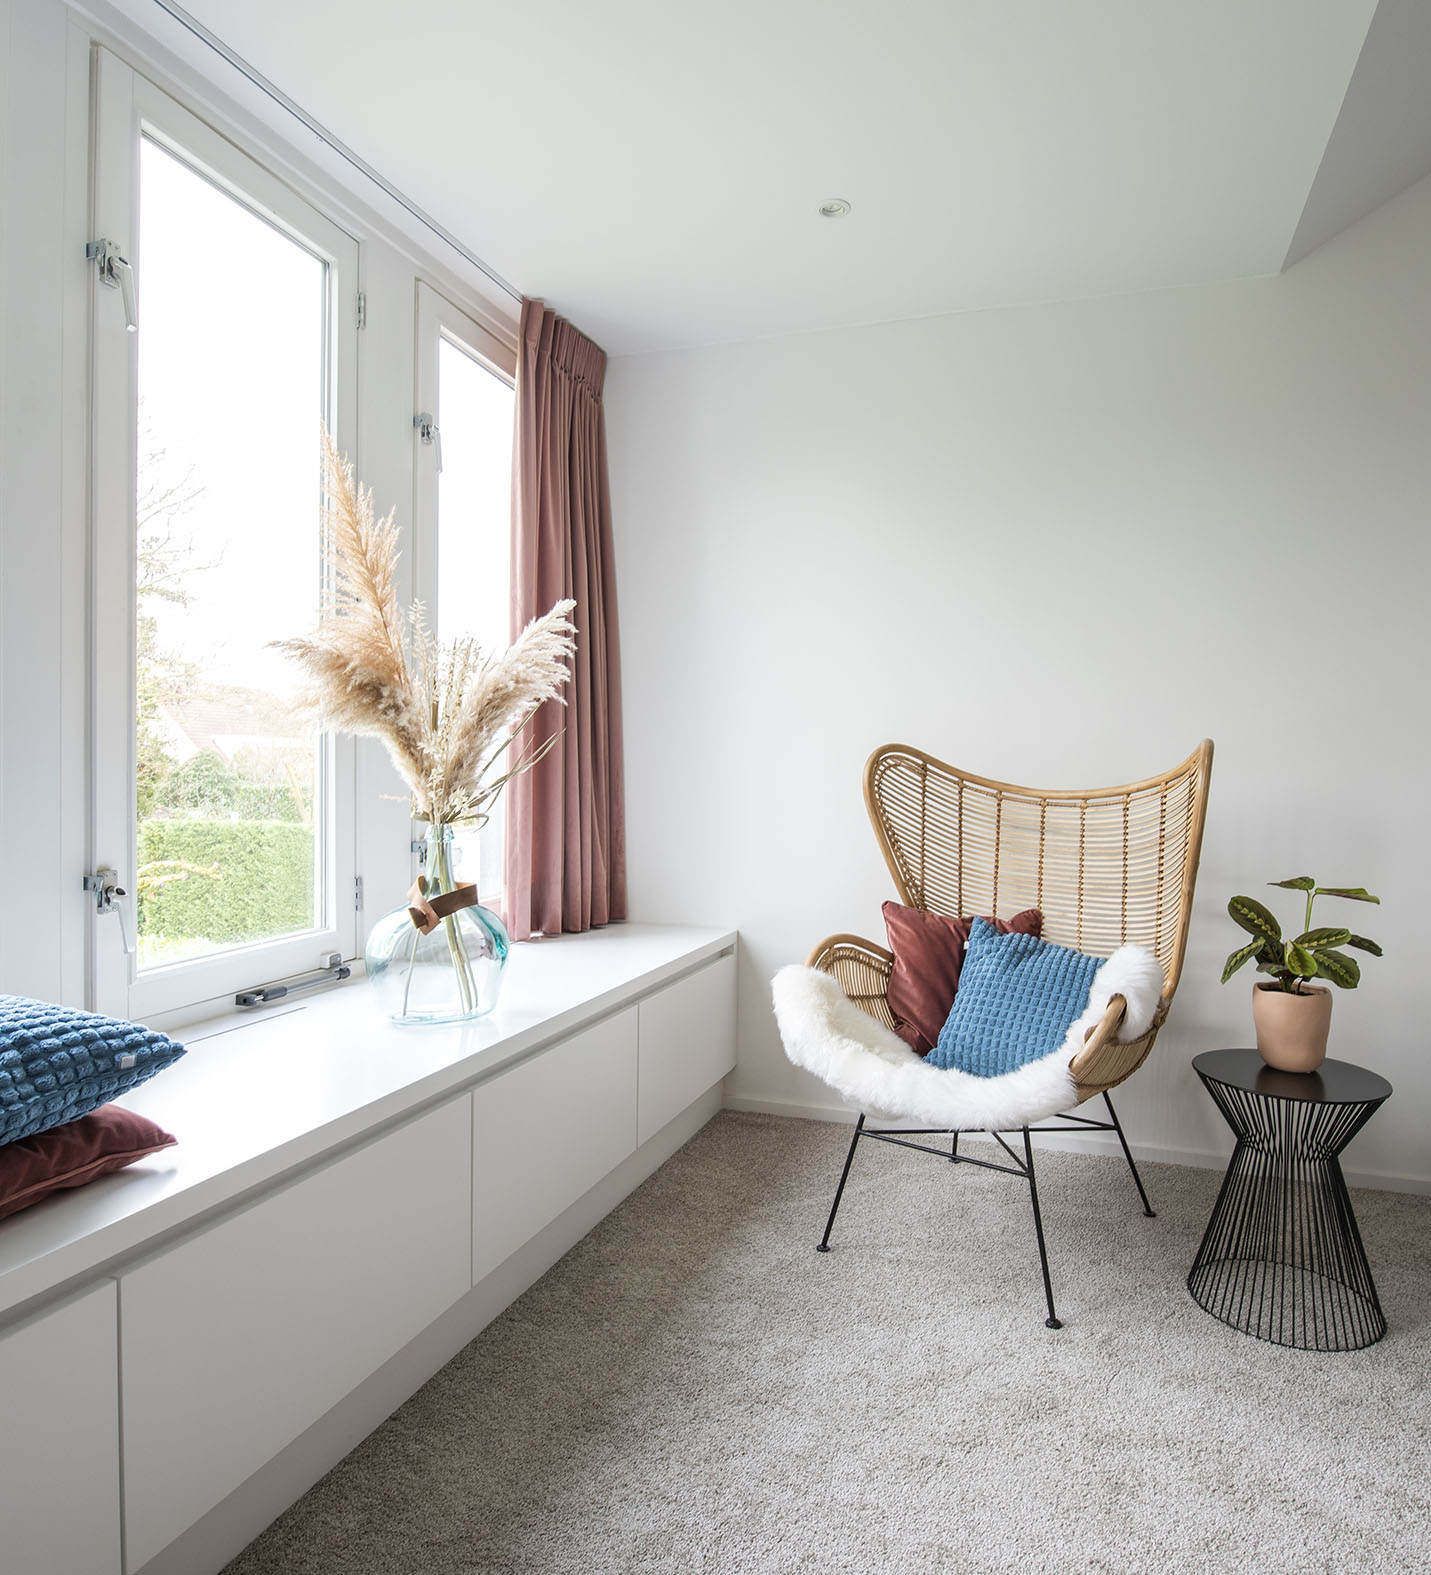 Slaapkamer hk living stoel interieuradvies Den Bosch Engelen slaapkamer stylen studio k2k